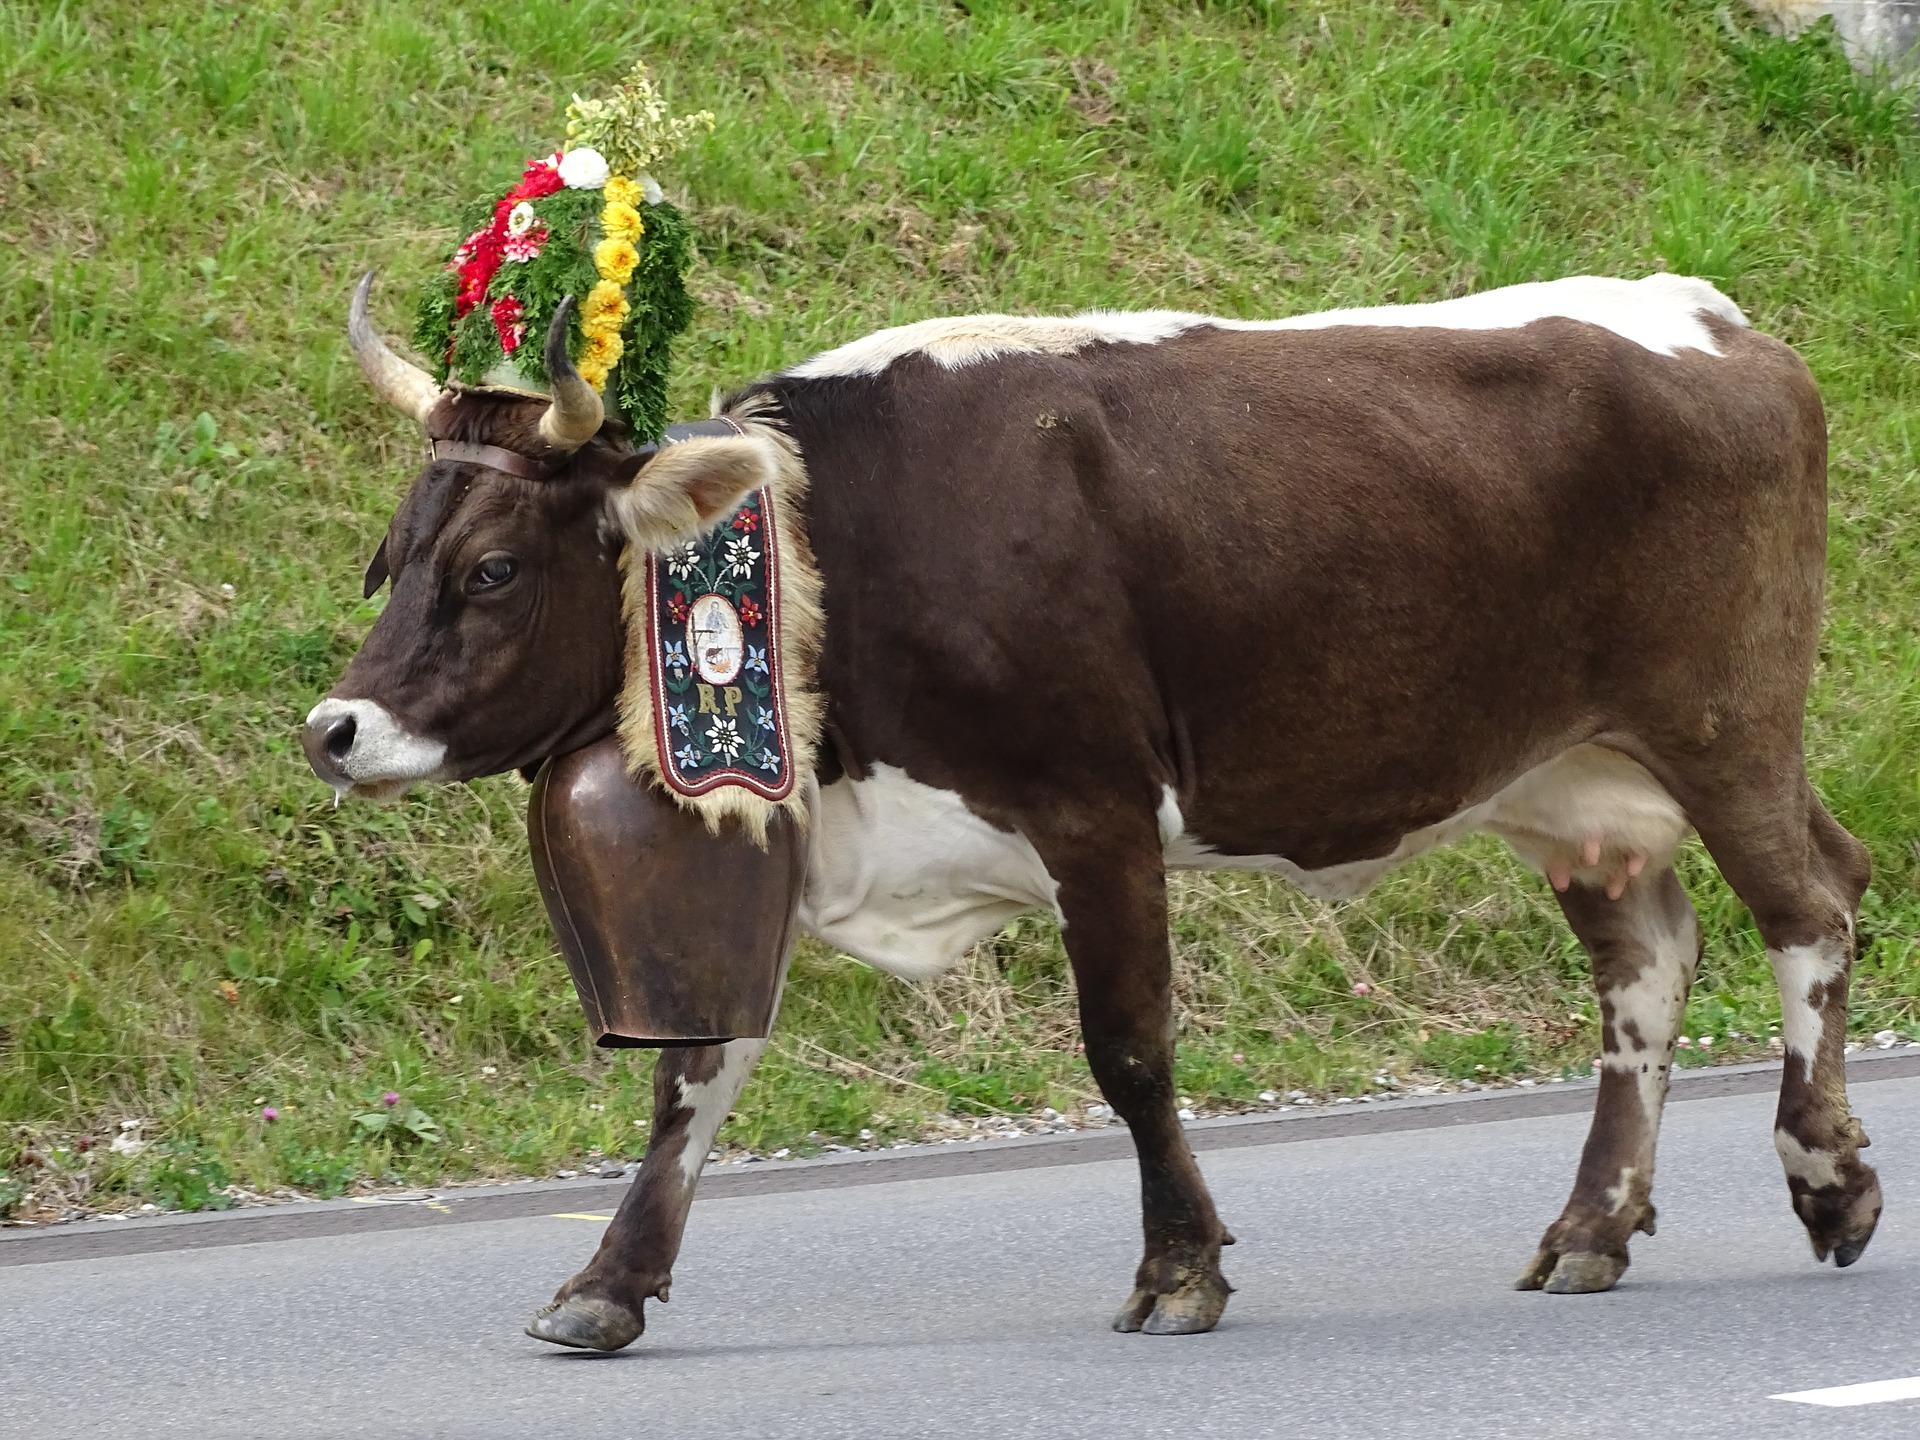 cow-2750335_1920.jpg